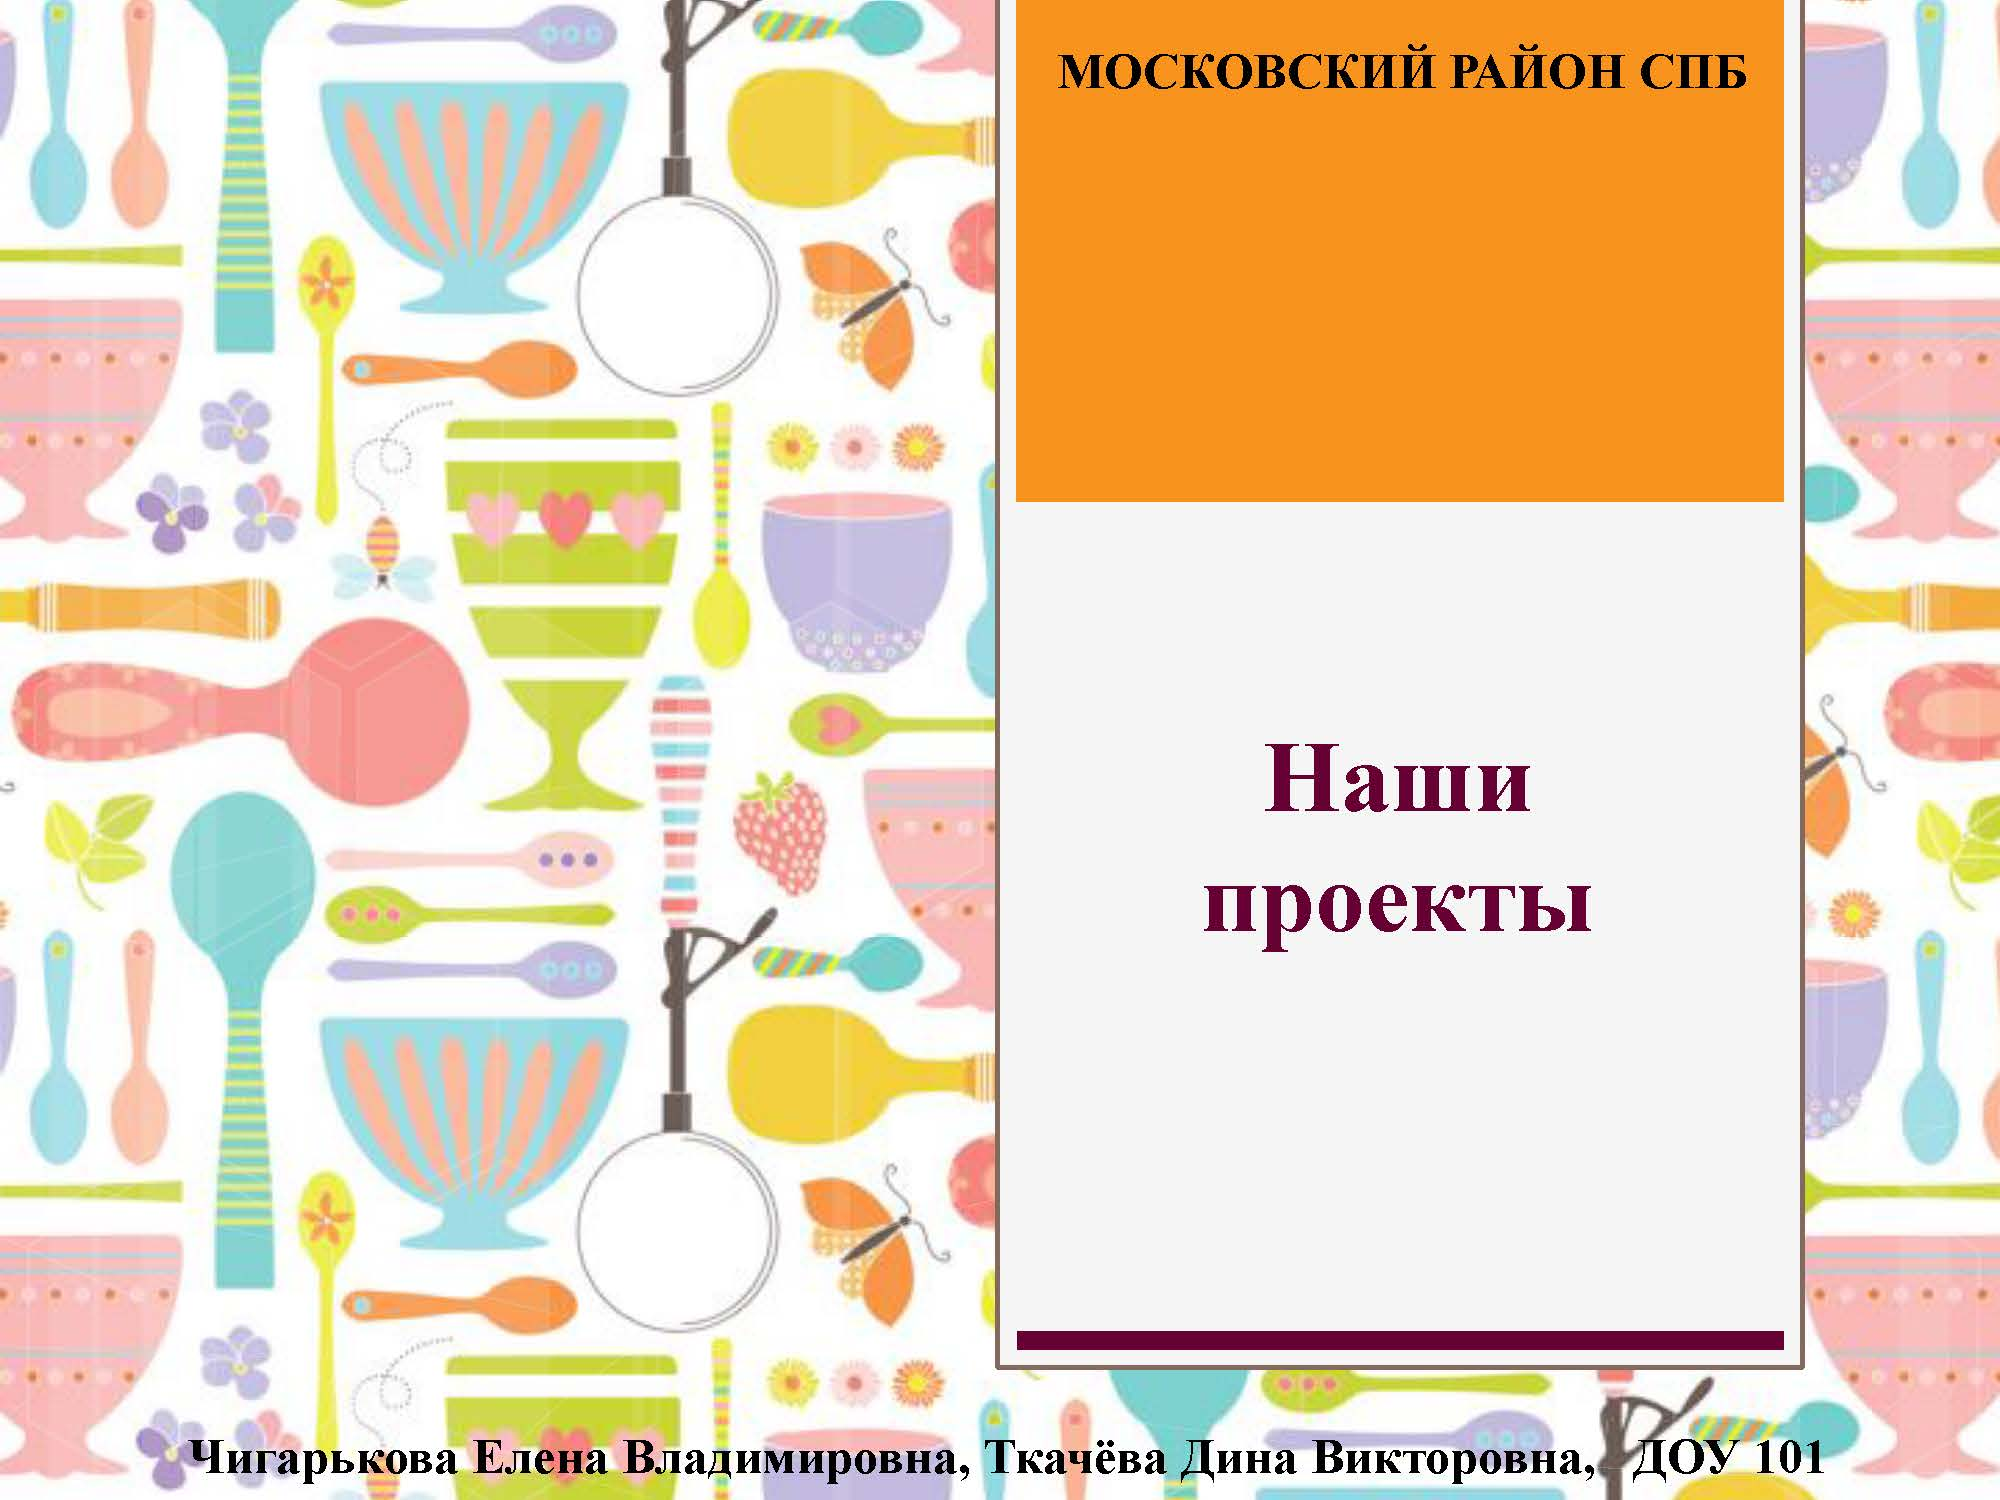 Секция 8. ДОУ 101, ПСИ. Московский район_Страница_04